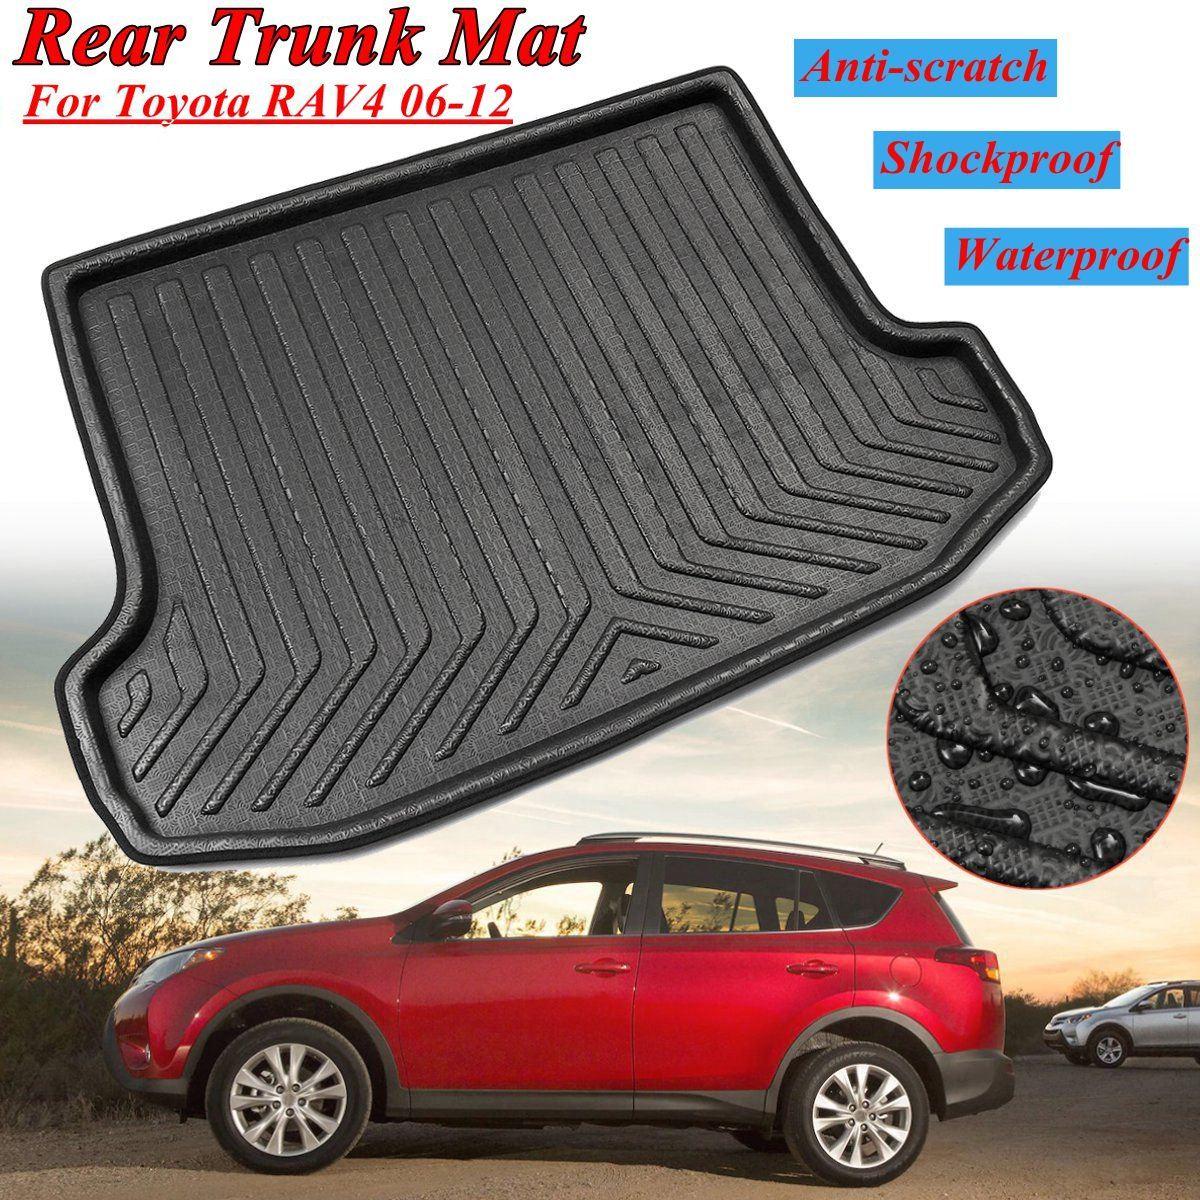 for Toyota RAV4 2006 2007 2008 2009 2010 2011 2012 High Quality Floor Mats Rear Trunk Cargo Mat Floor Tray Boot Liner Waterproof